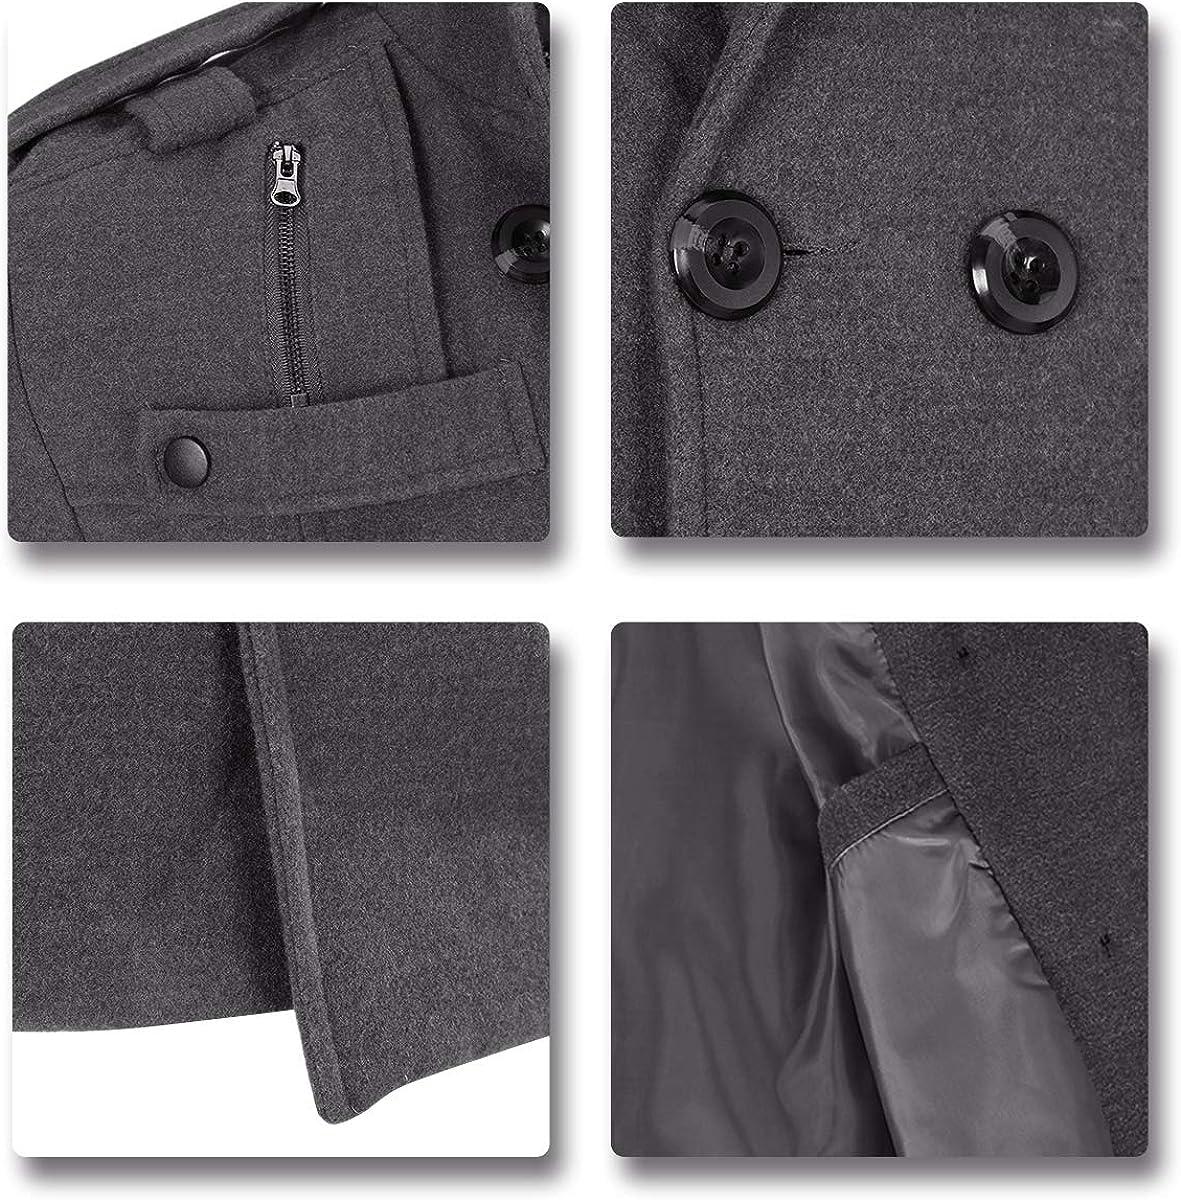 Grey XL AOWOFS Mens Coat Slim Fit Winter Coat Double Breasted Woolen Coat Short for Autumn Winter